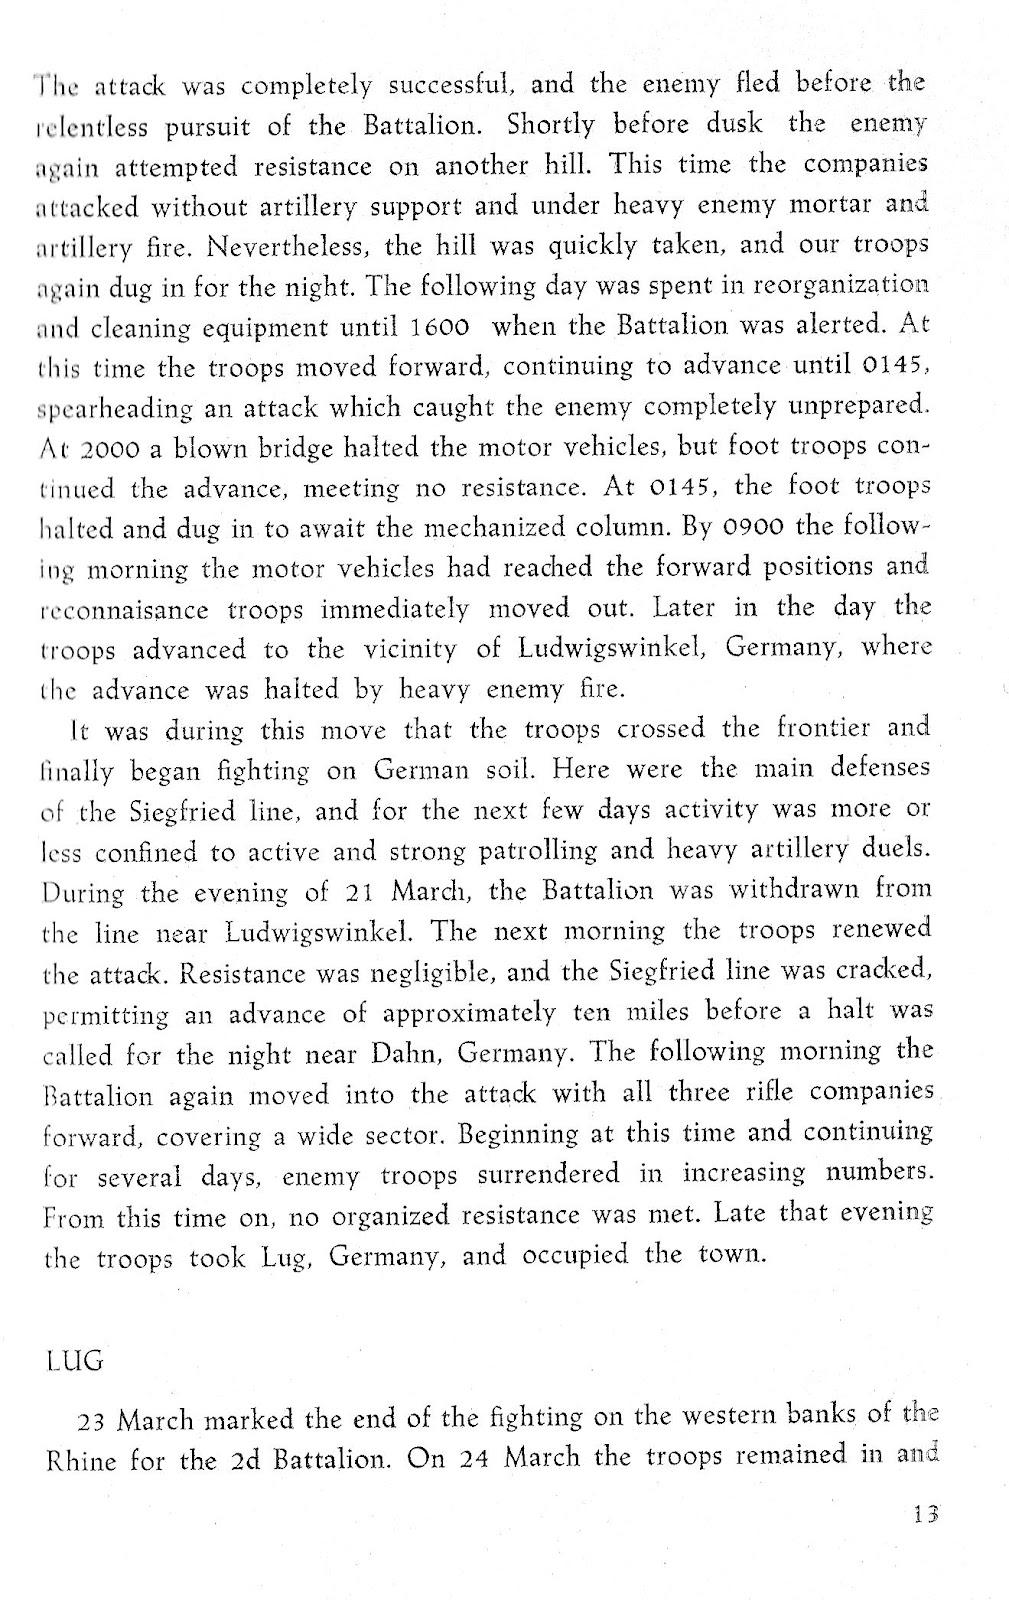 History pg13.jpg